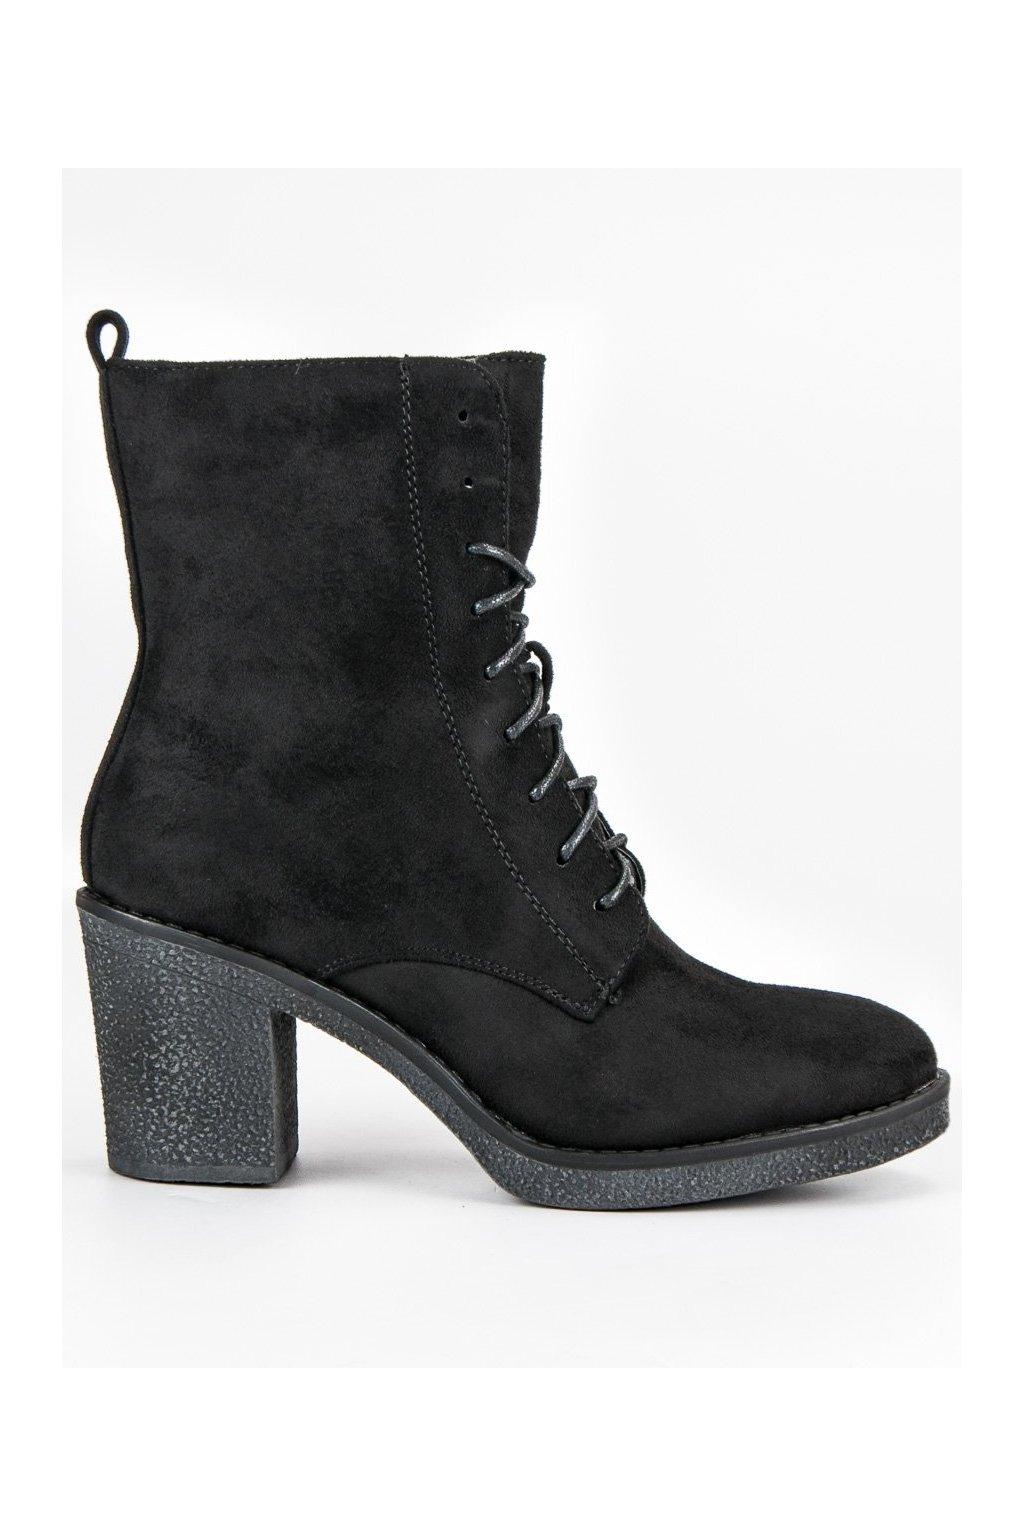 Čierne členkové topánky na hrubom opätku Super Mode